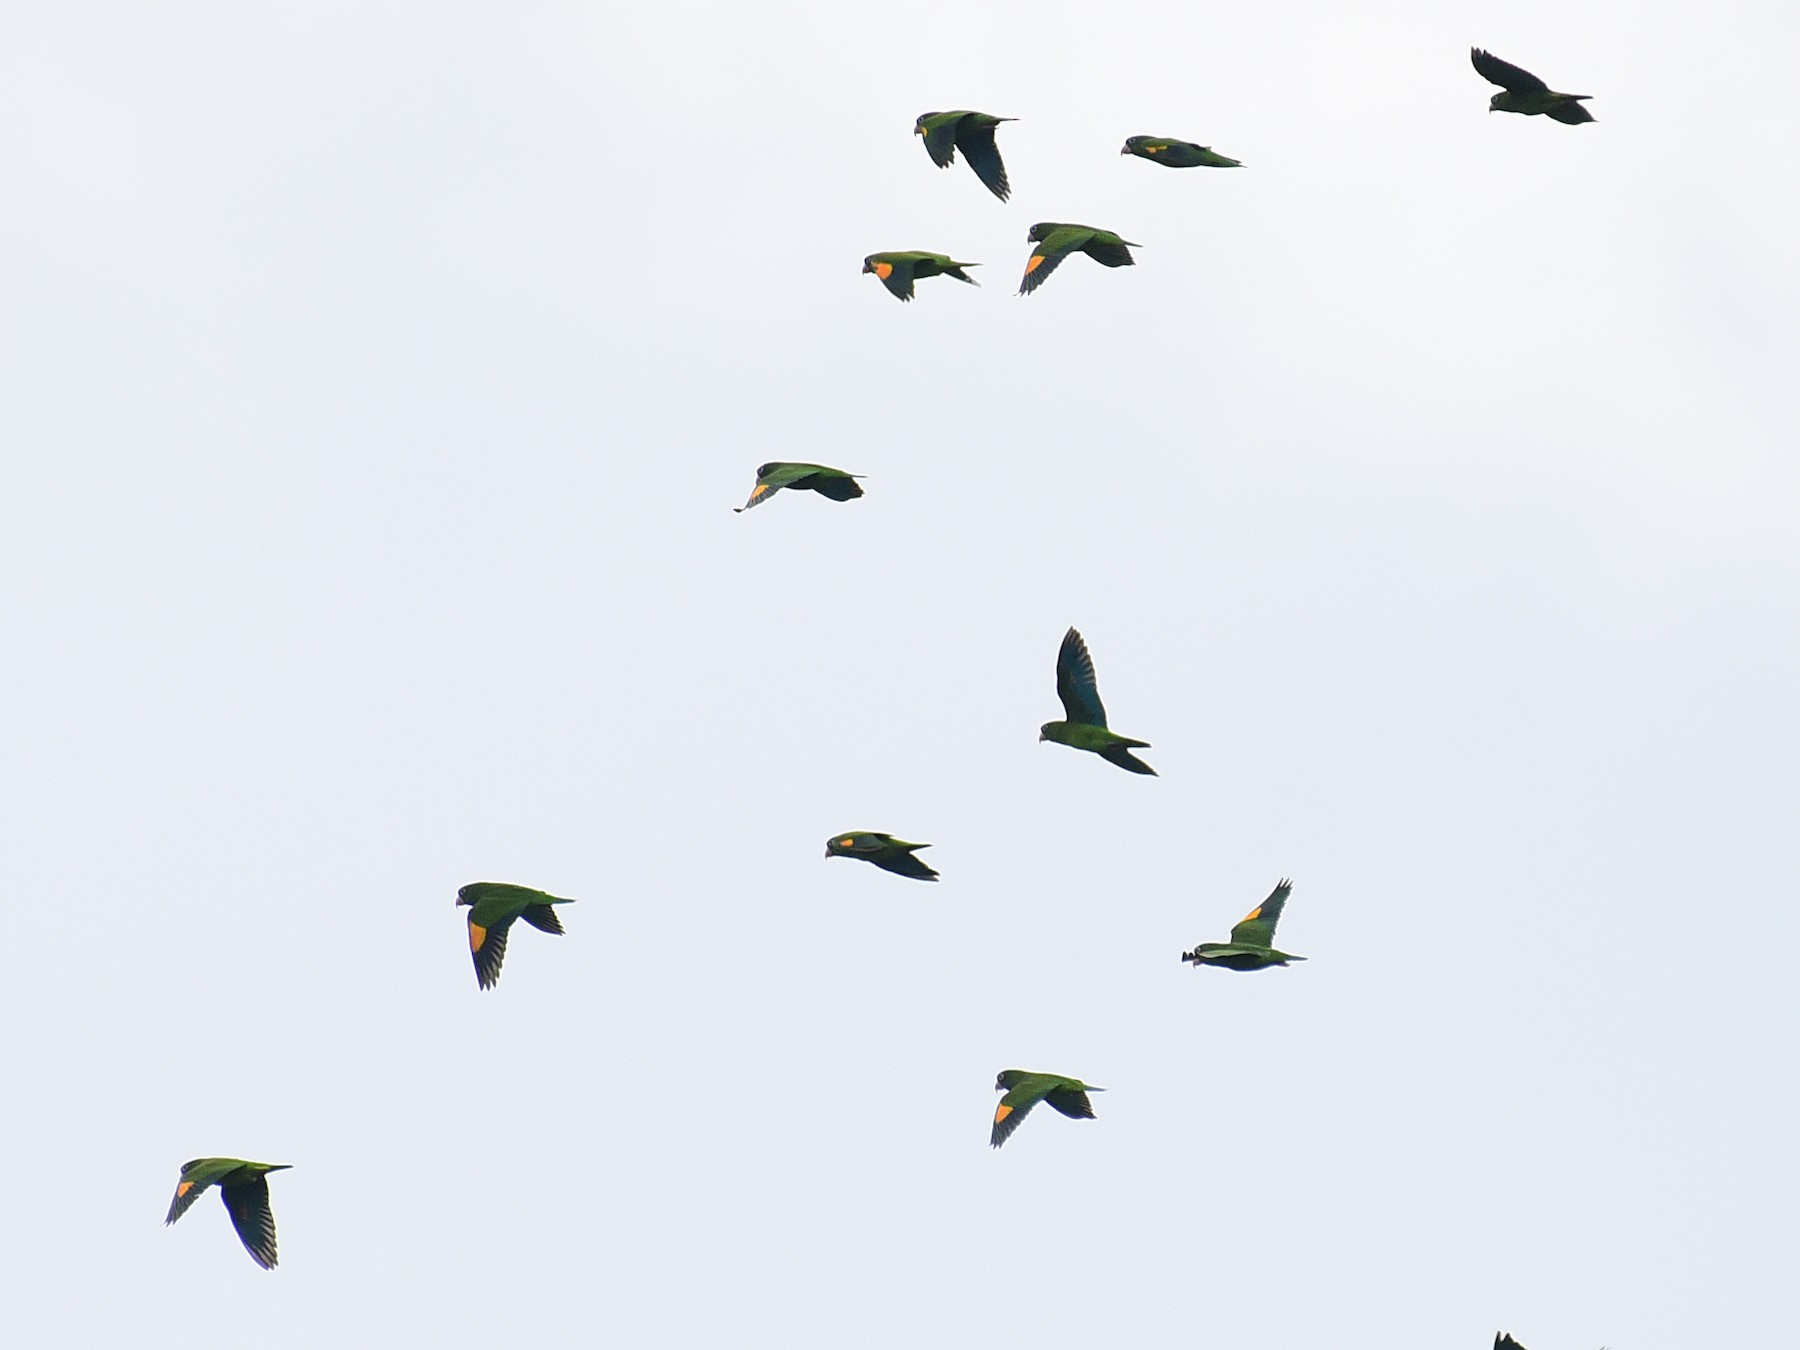 Golden-winged Parakeet - Luiz Moschini